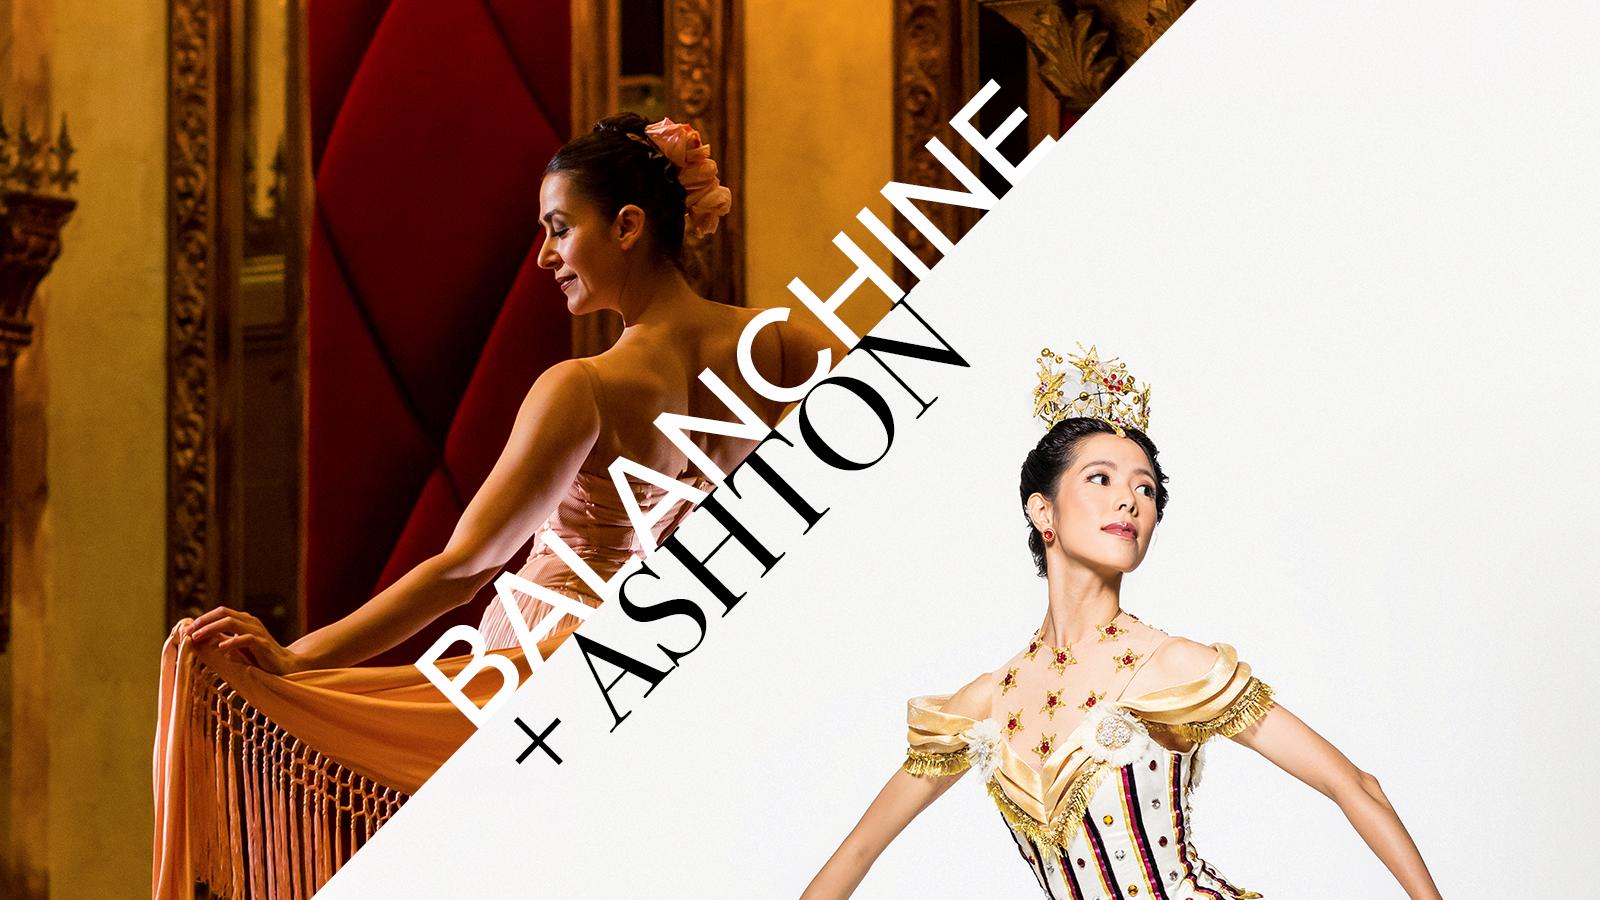 BALANCHINE + ASHTON